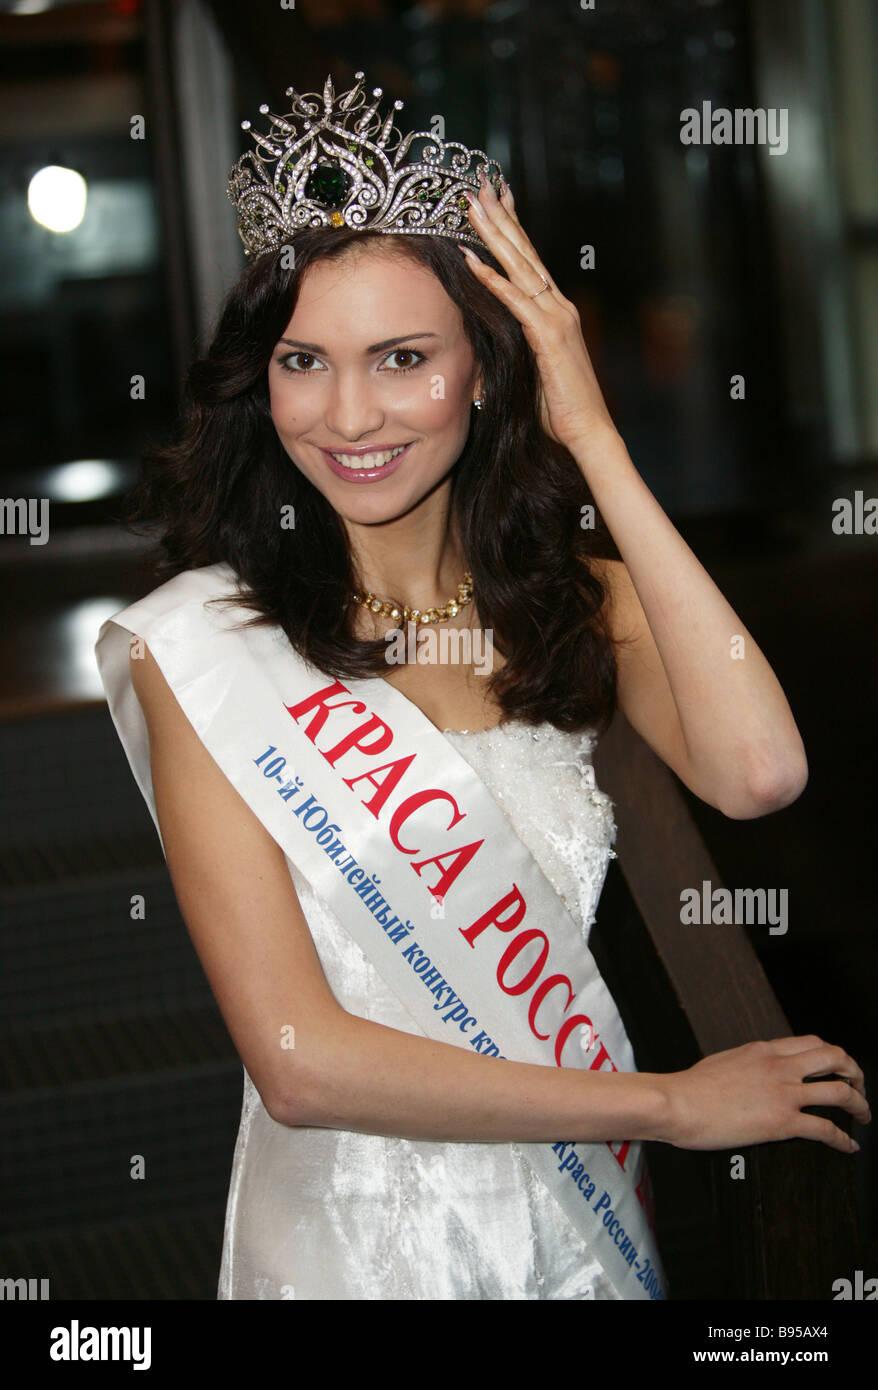 Miss Russian Beauty 2004 Tatiana Sidorchuk - Stock Image